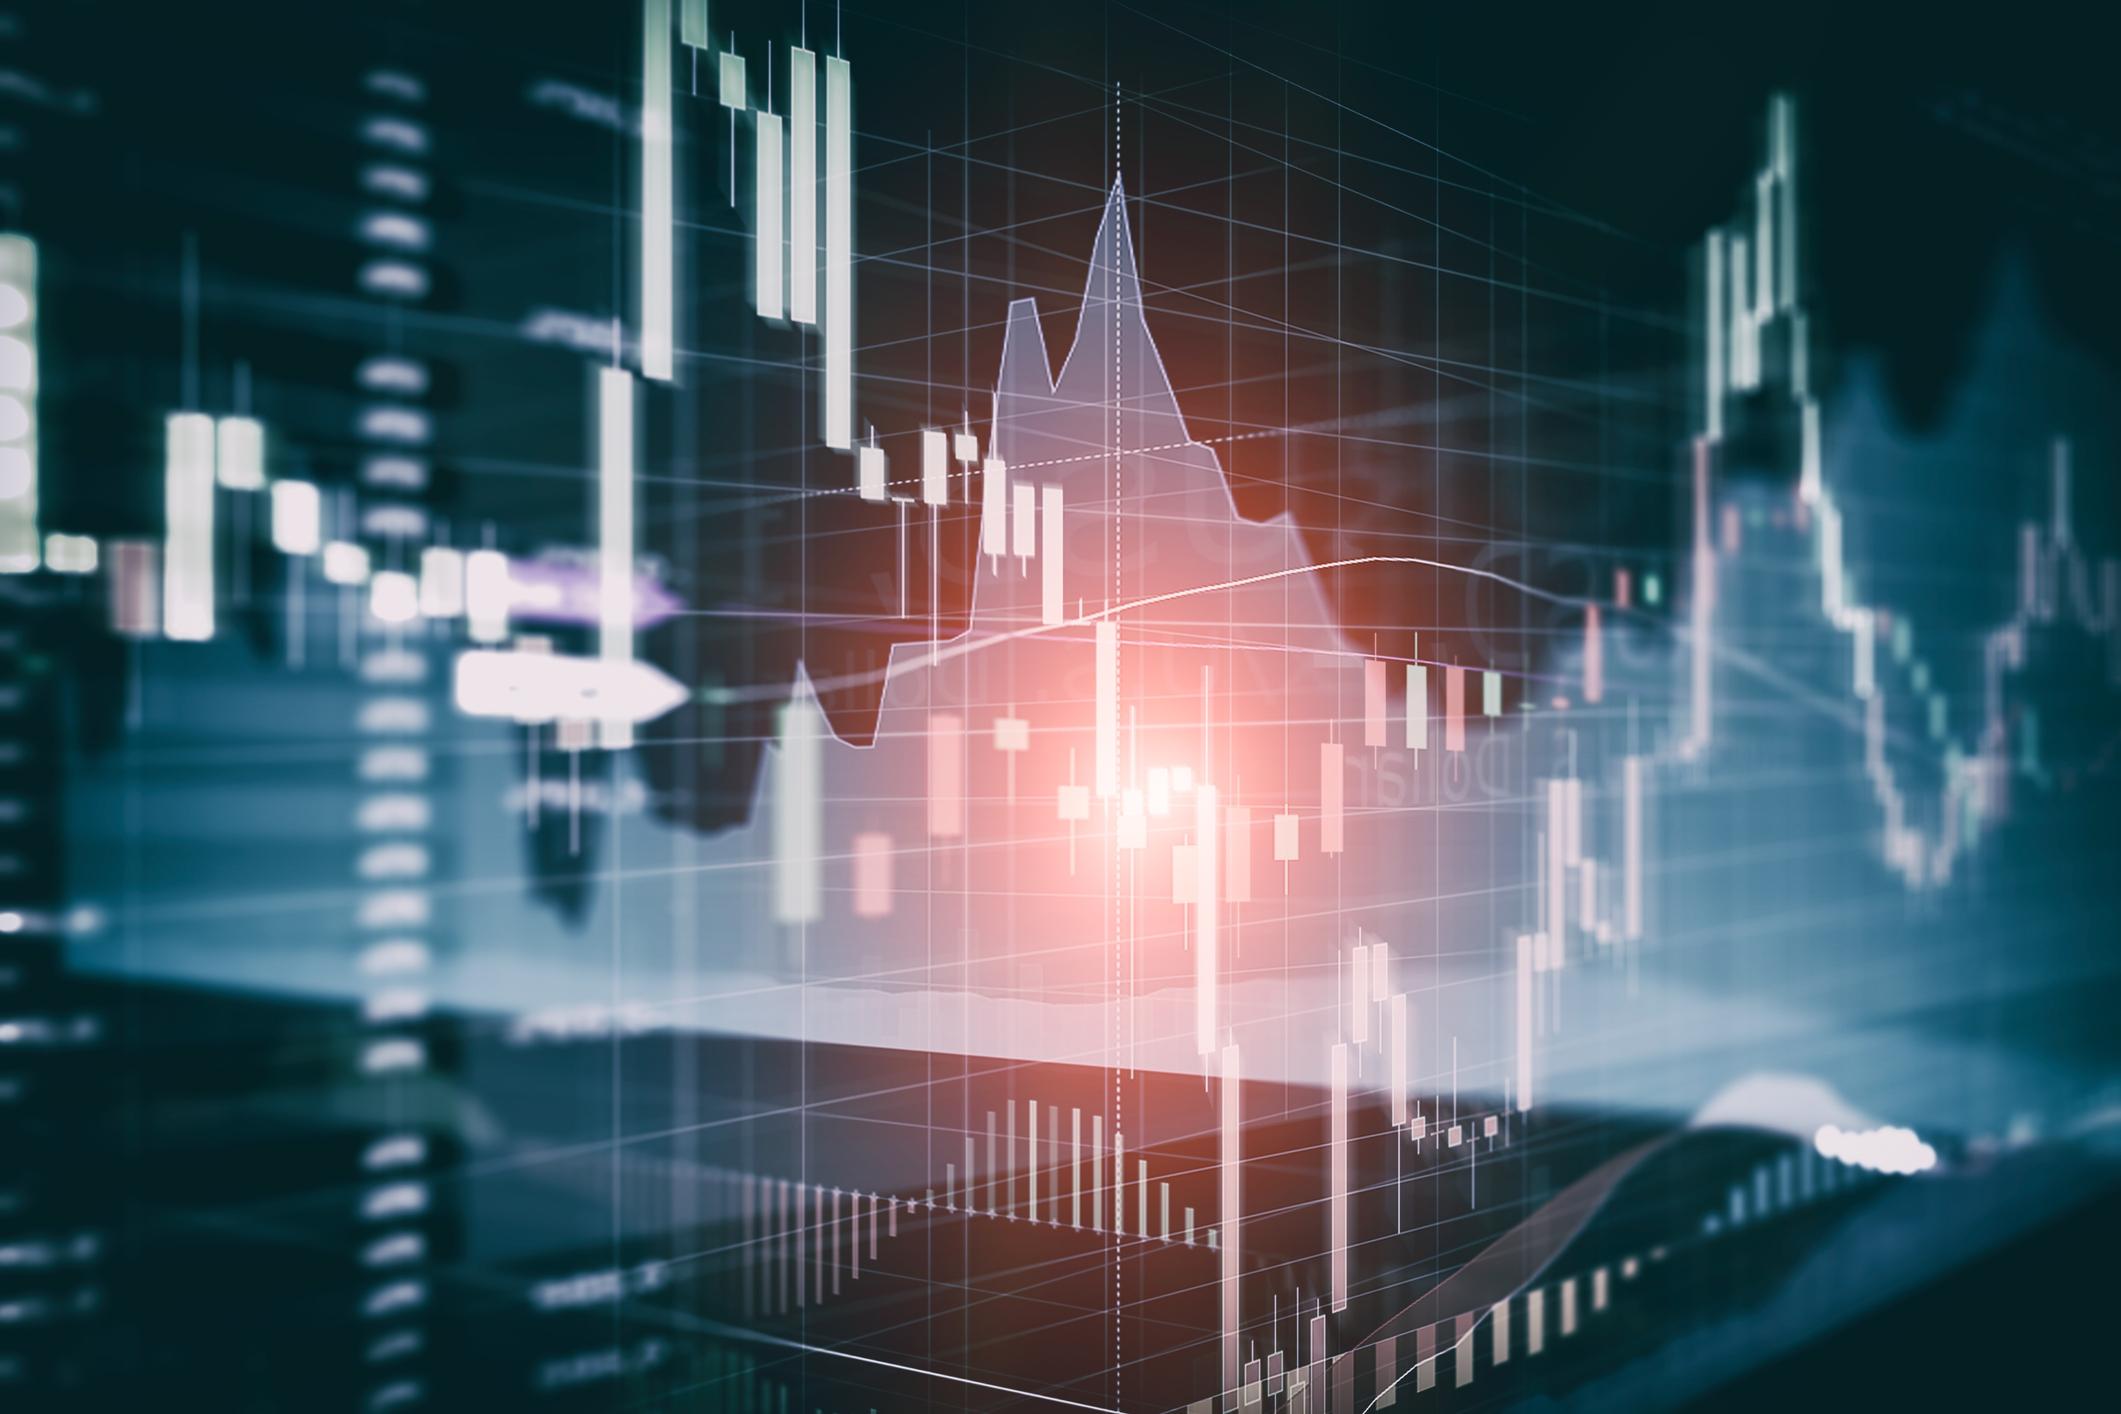 Abstract stock charts.